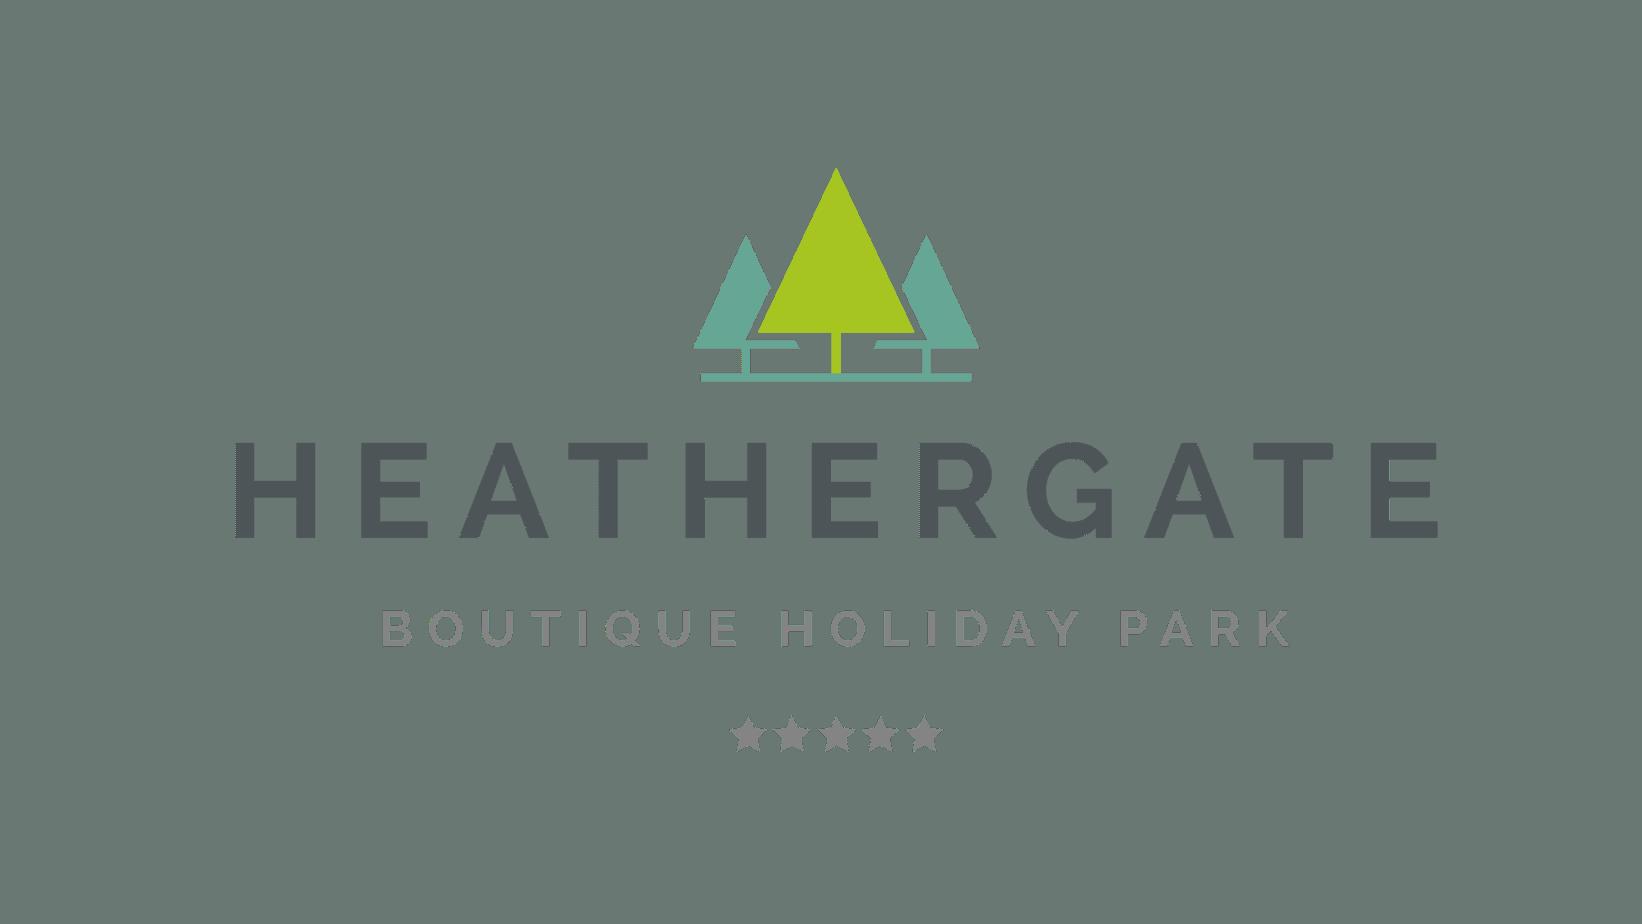 Heathergate logo